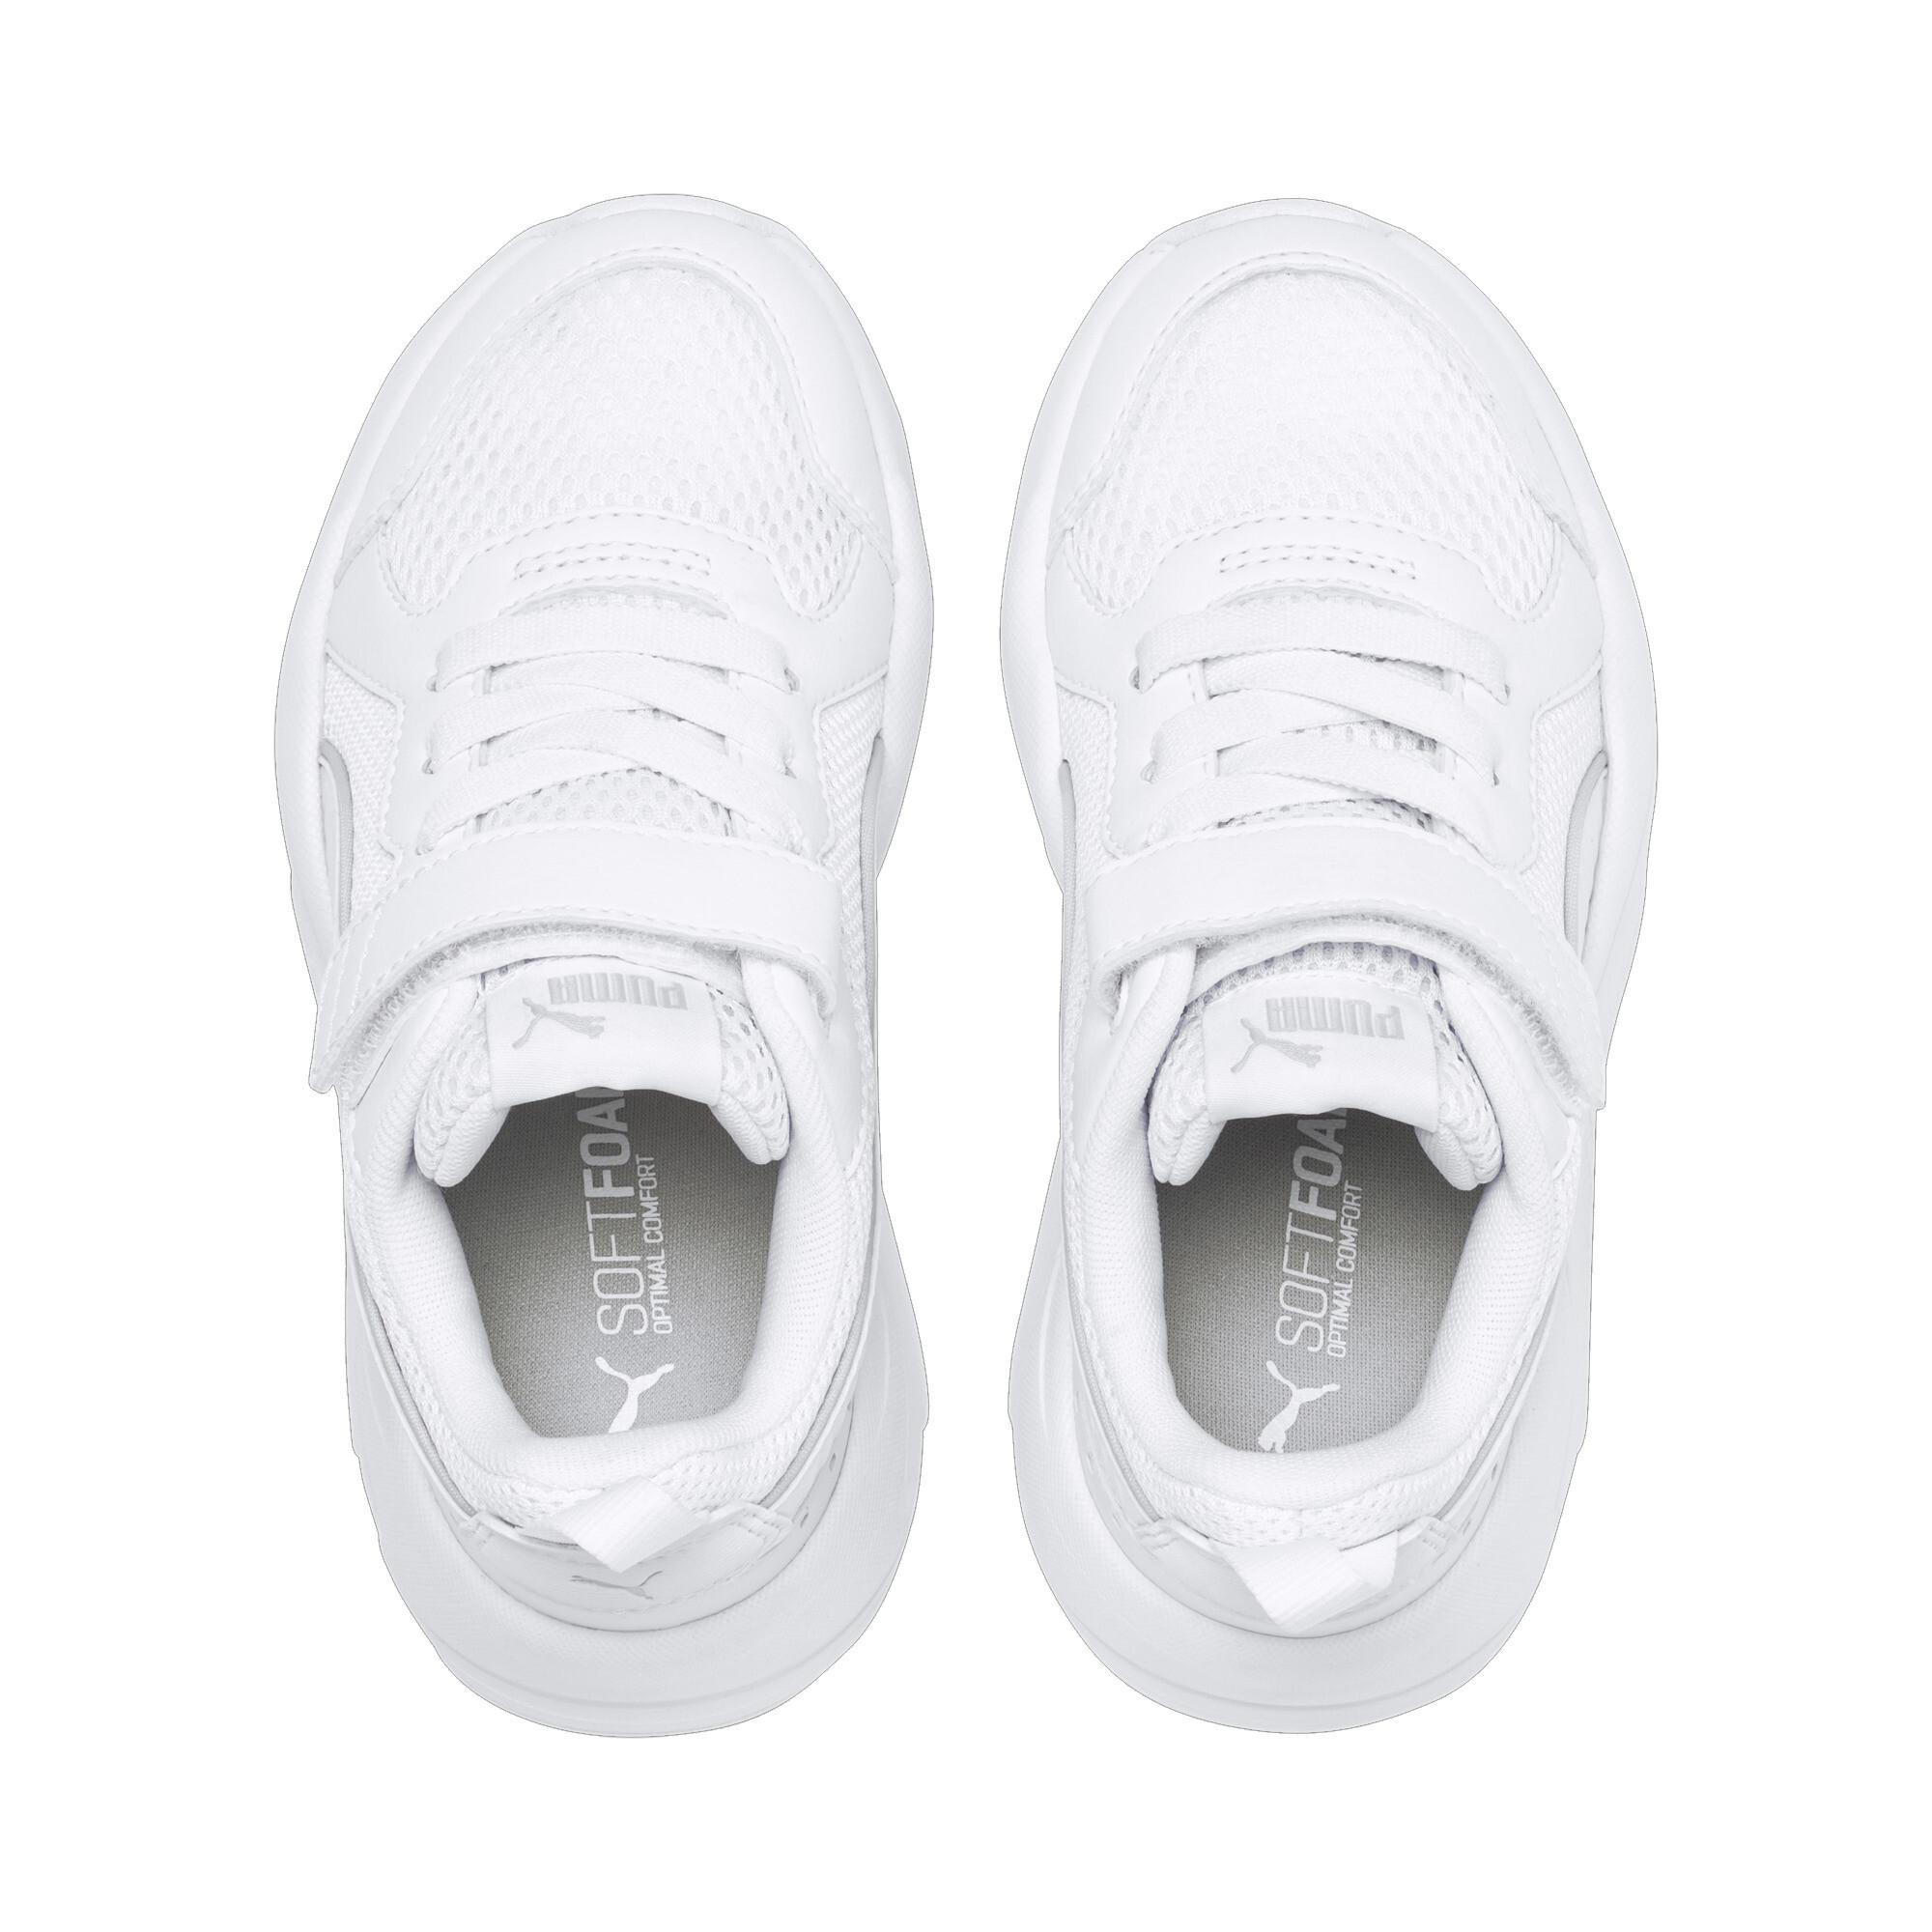 PUMA-X-RAY-Little-Kids-039-Shoes-Kids-Shoe-Kids thumbnail 13